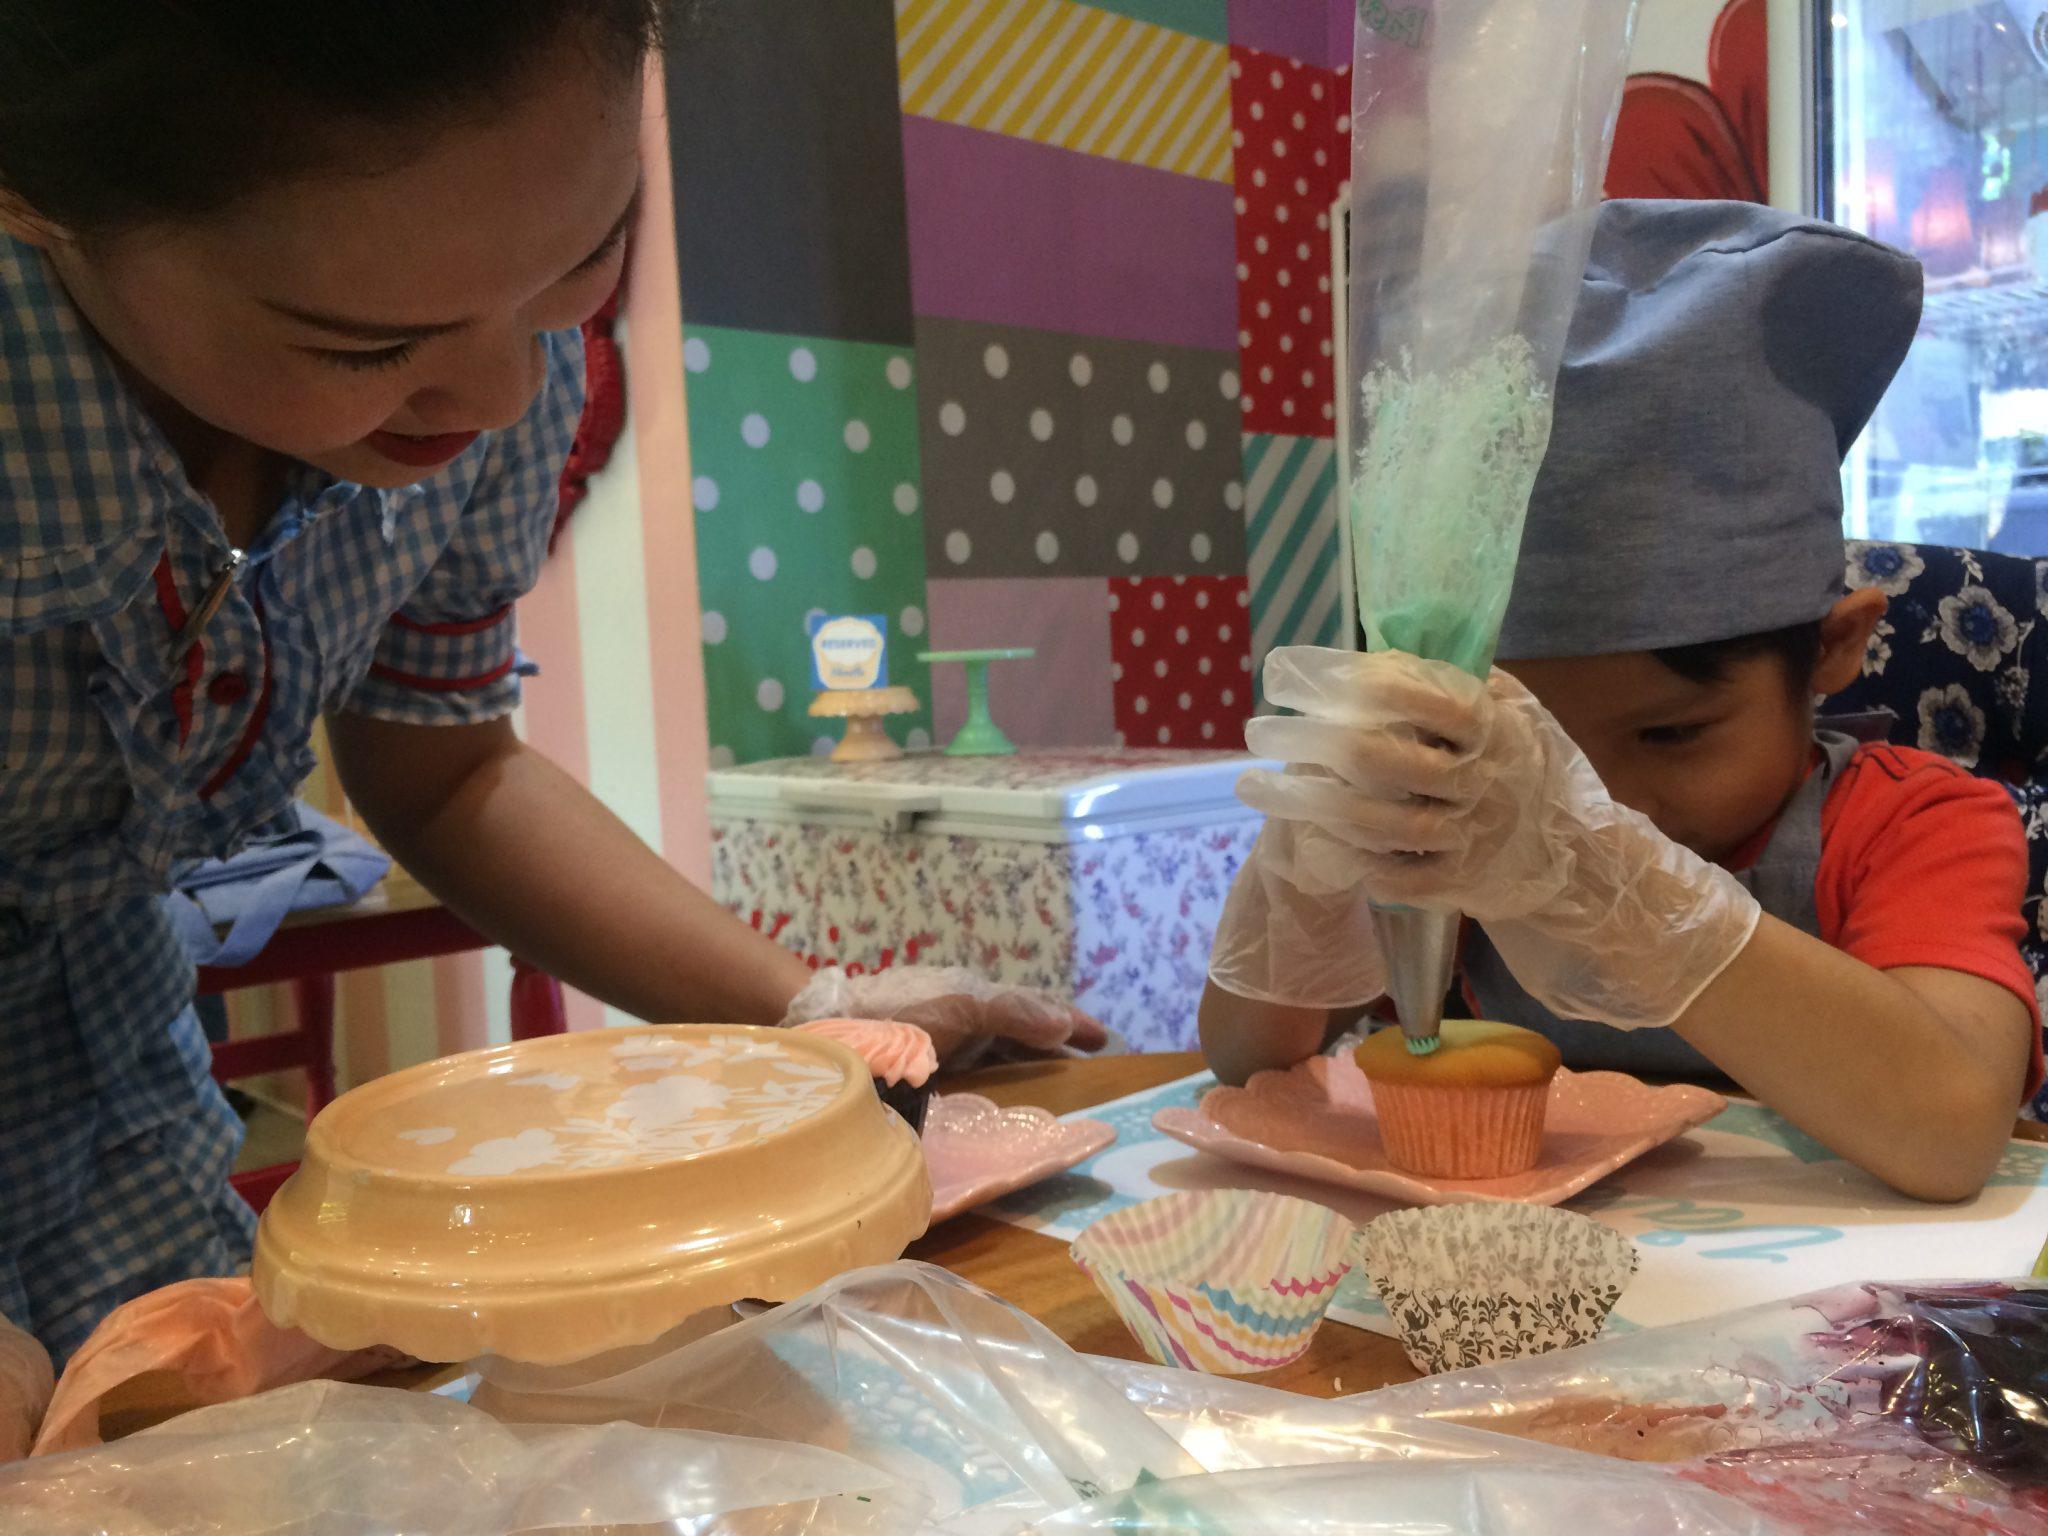 cupcake-decorating-kid